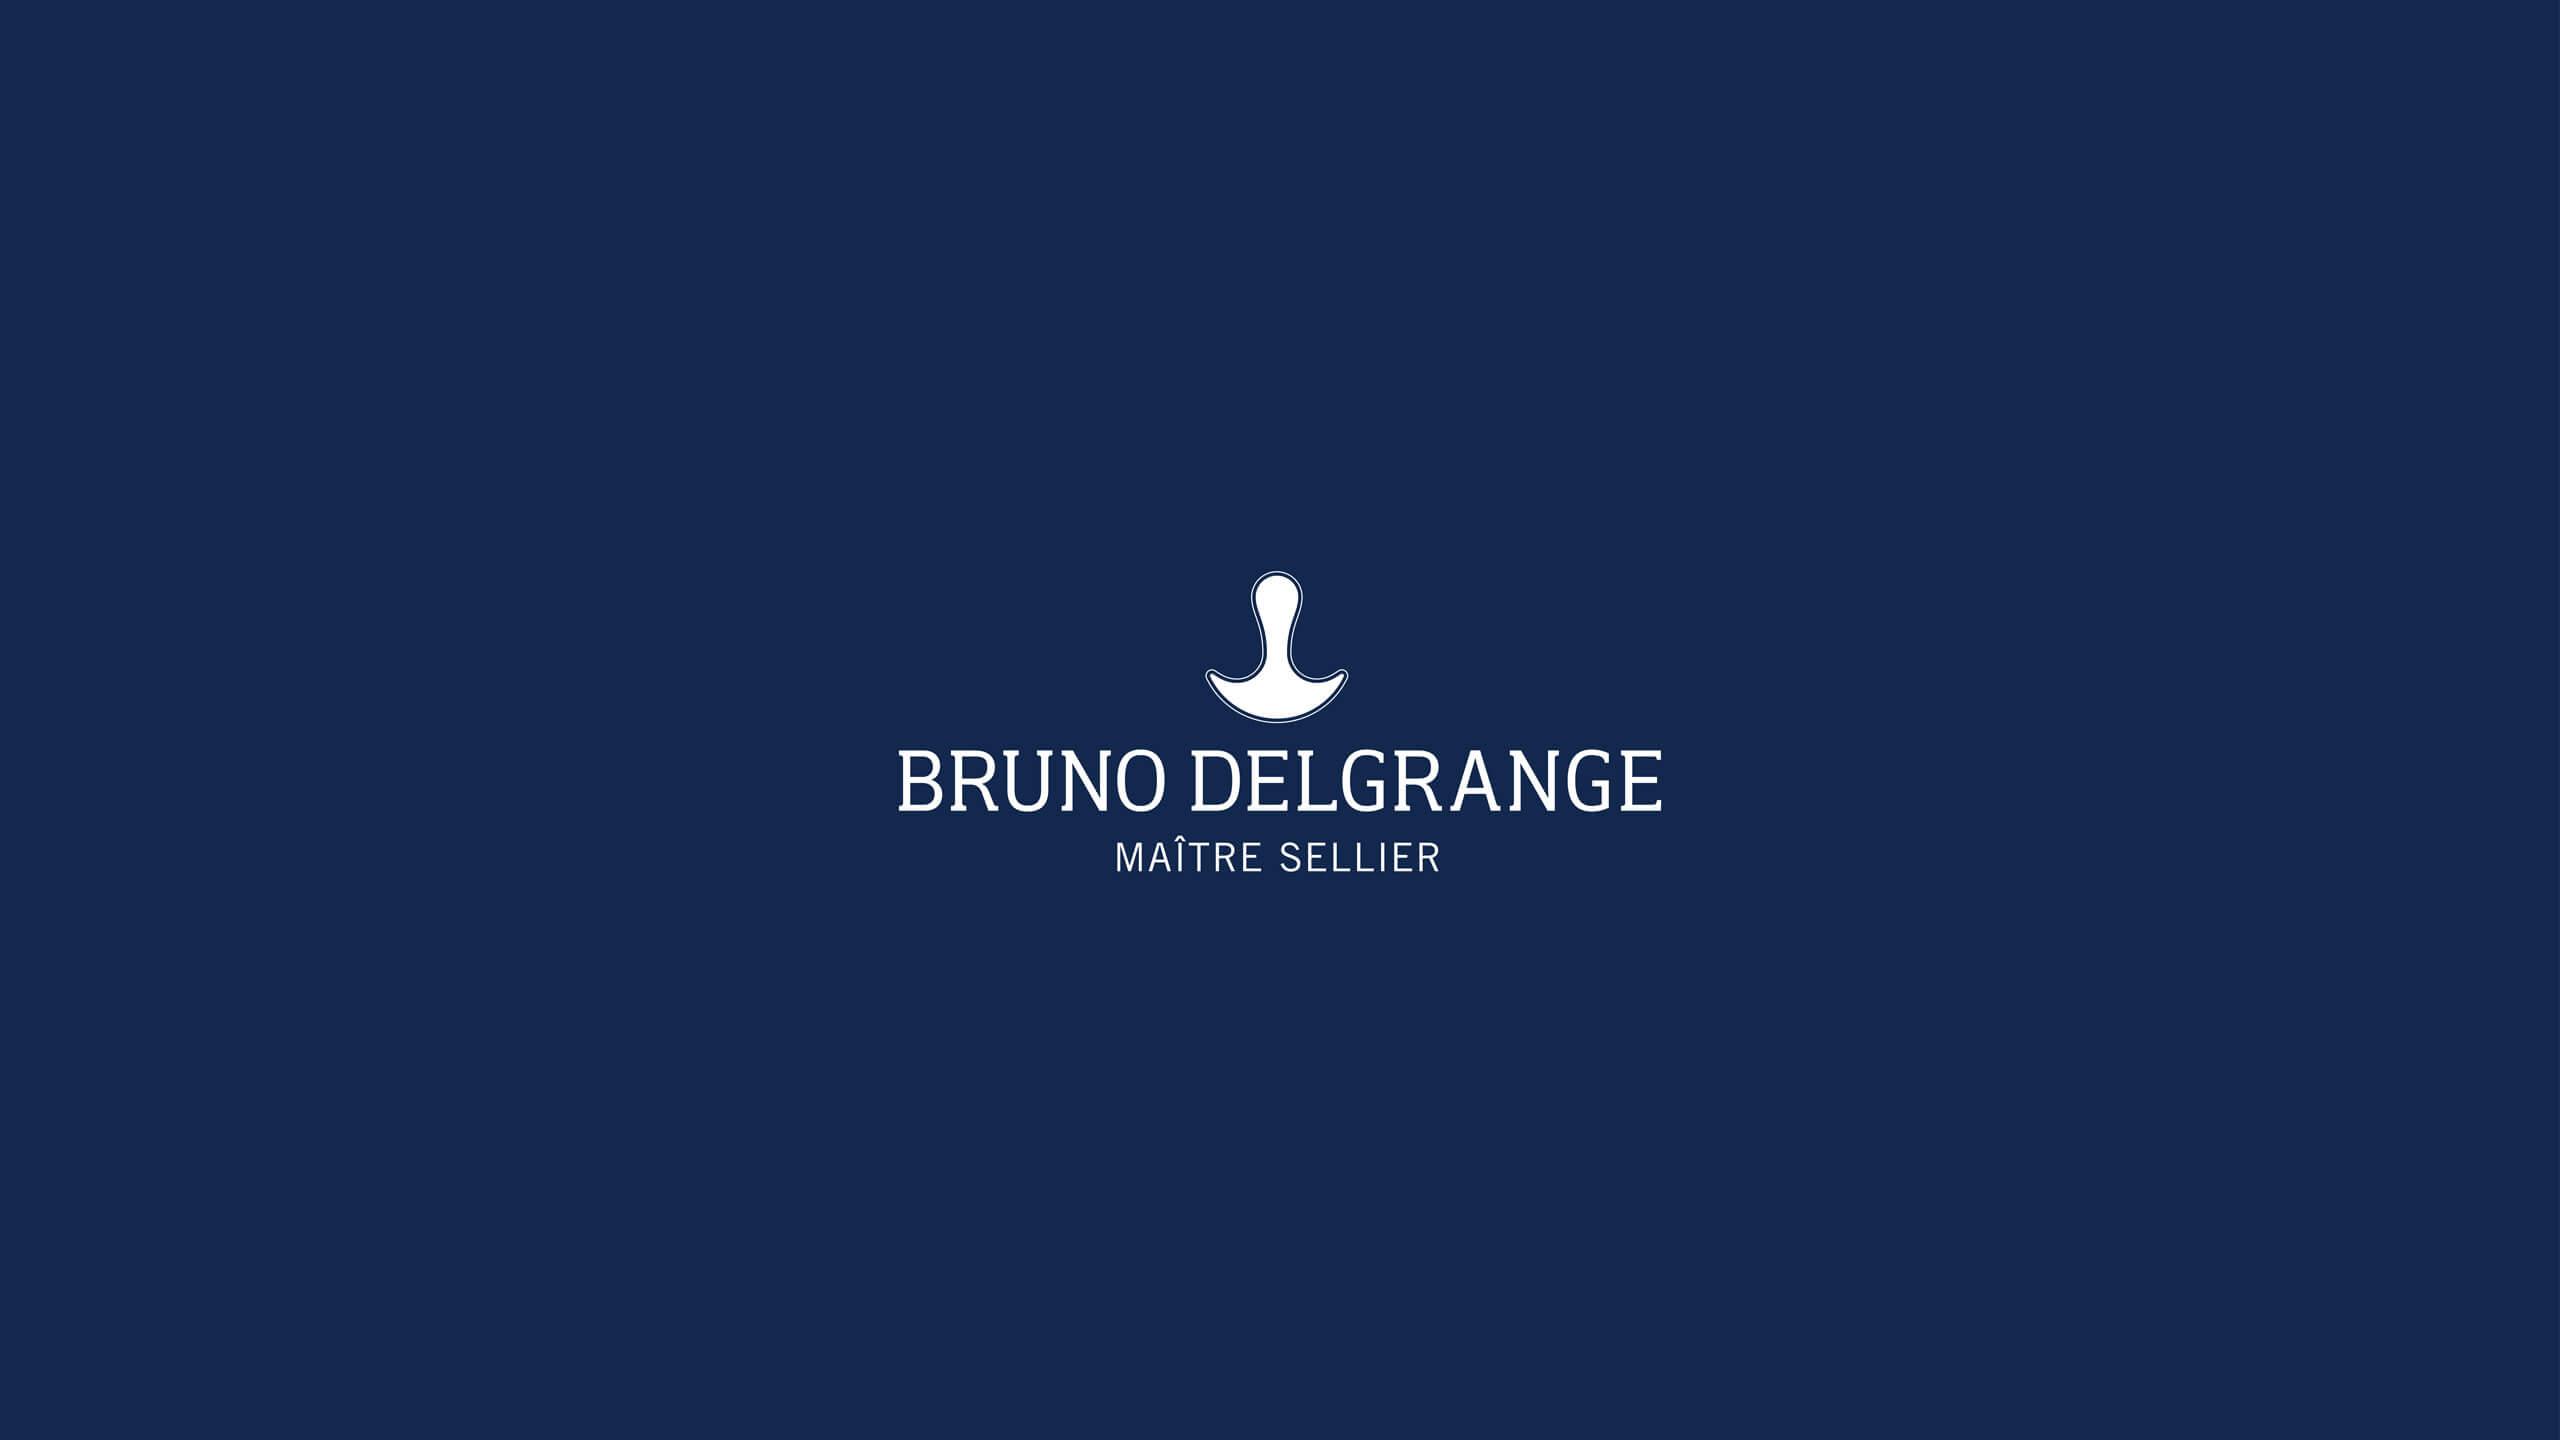 bruno-delgrange-header